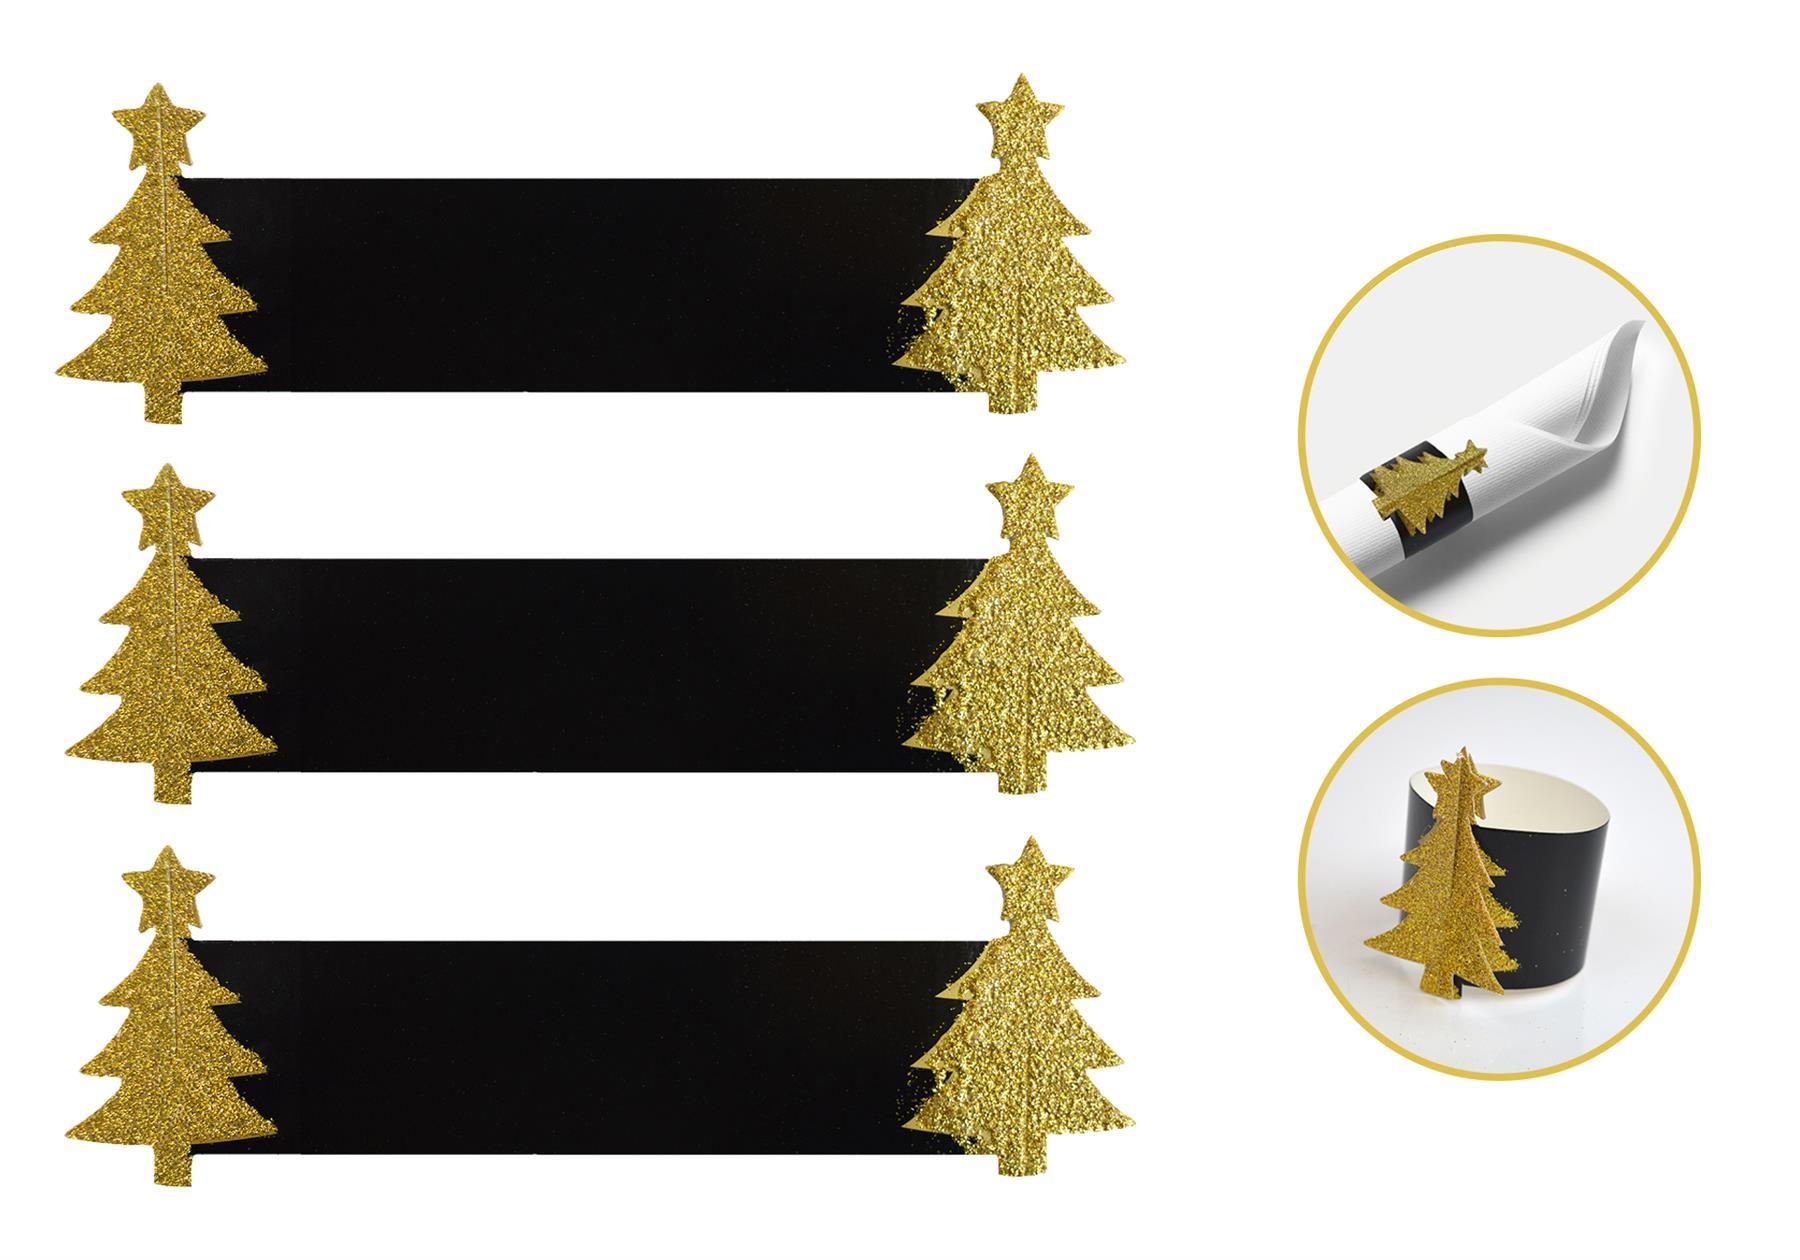 Home Textiles Kitchen Table Linens Luxury Red Felt Christmas Tree Napkin Rings Pack Of 4 Christmas Tableware Kopa Or Kr